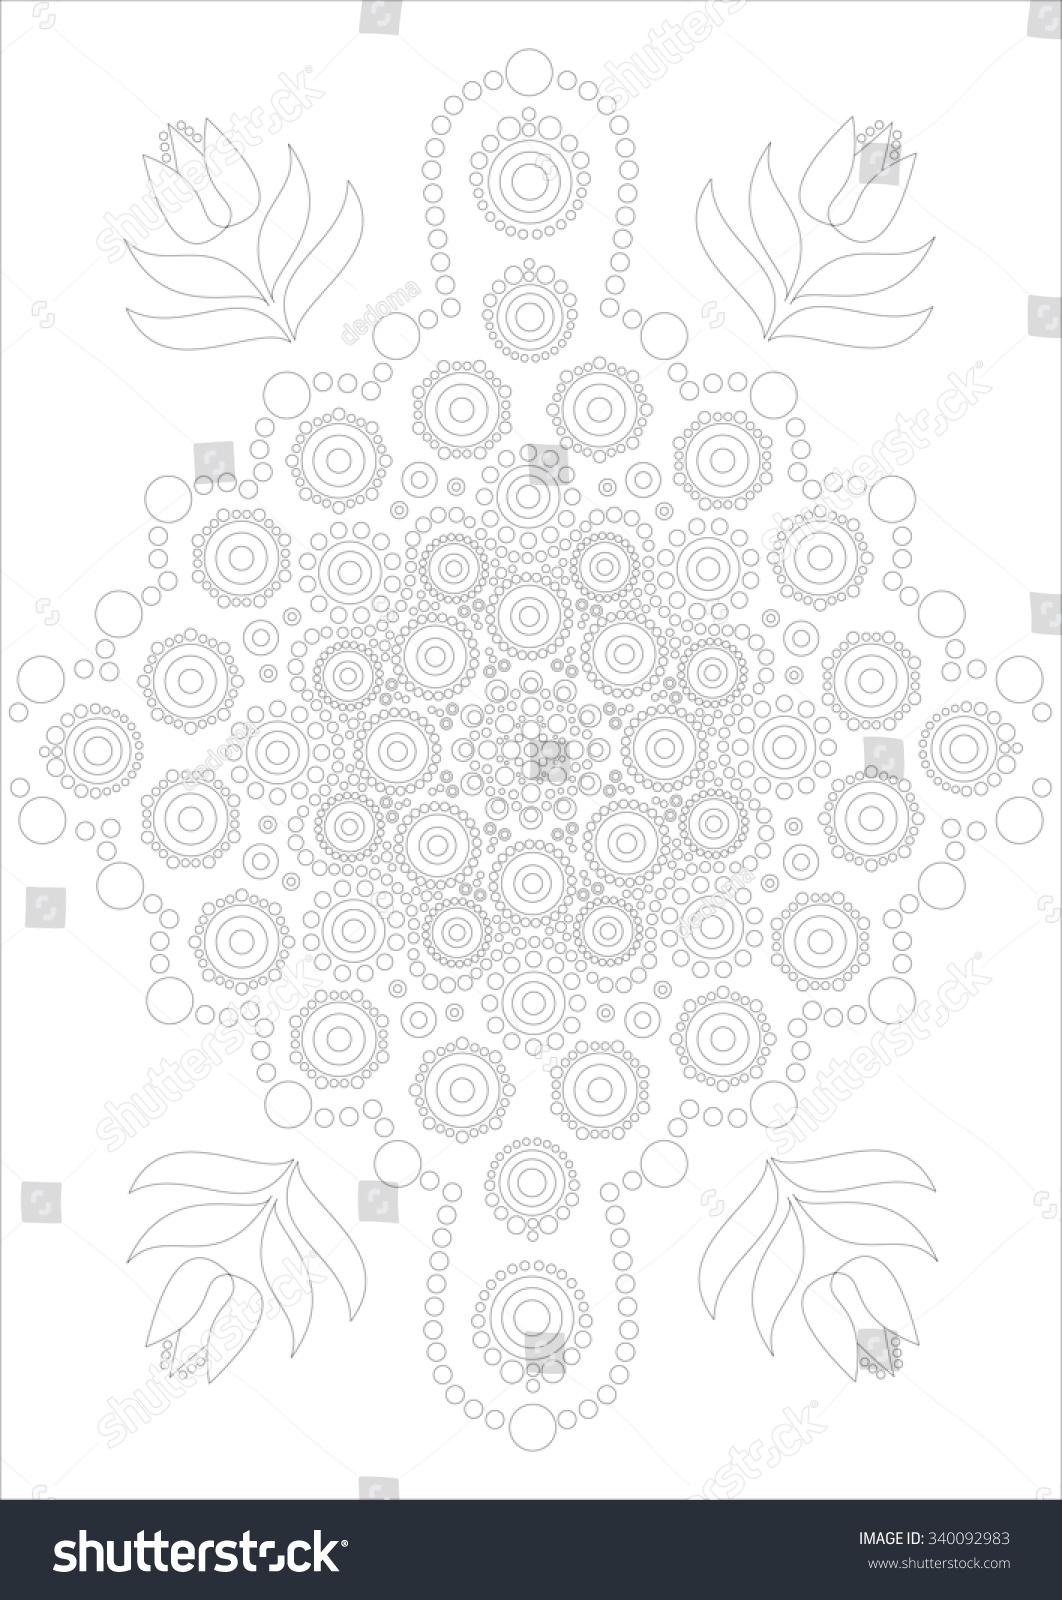 Aboriginal Style Dot Painting Power Mandala Stock Illustration